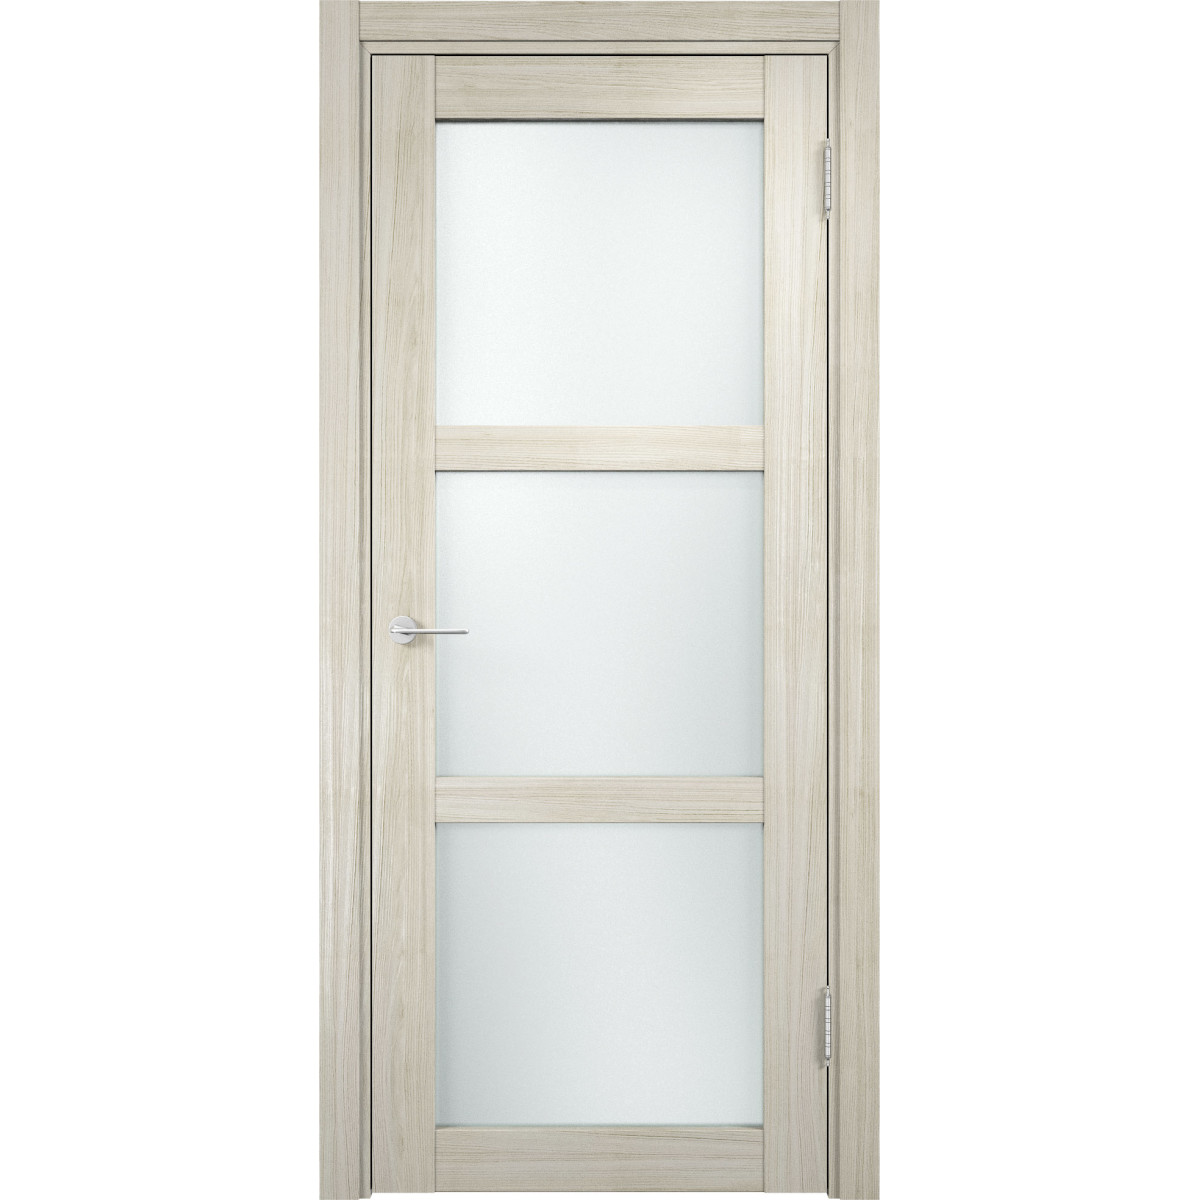 Дверное полотно Casaporte Рома МП_0096 2000х700х44 мм МДФ